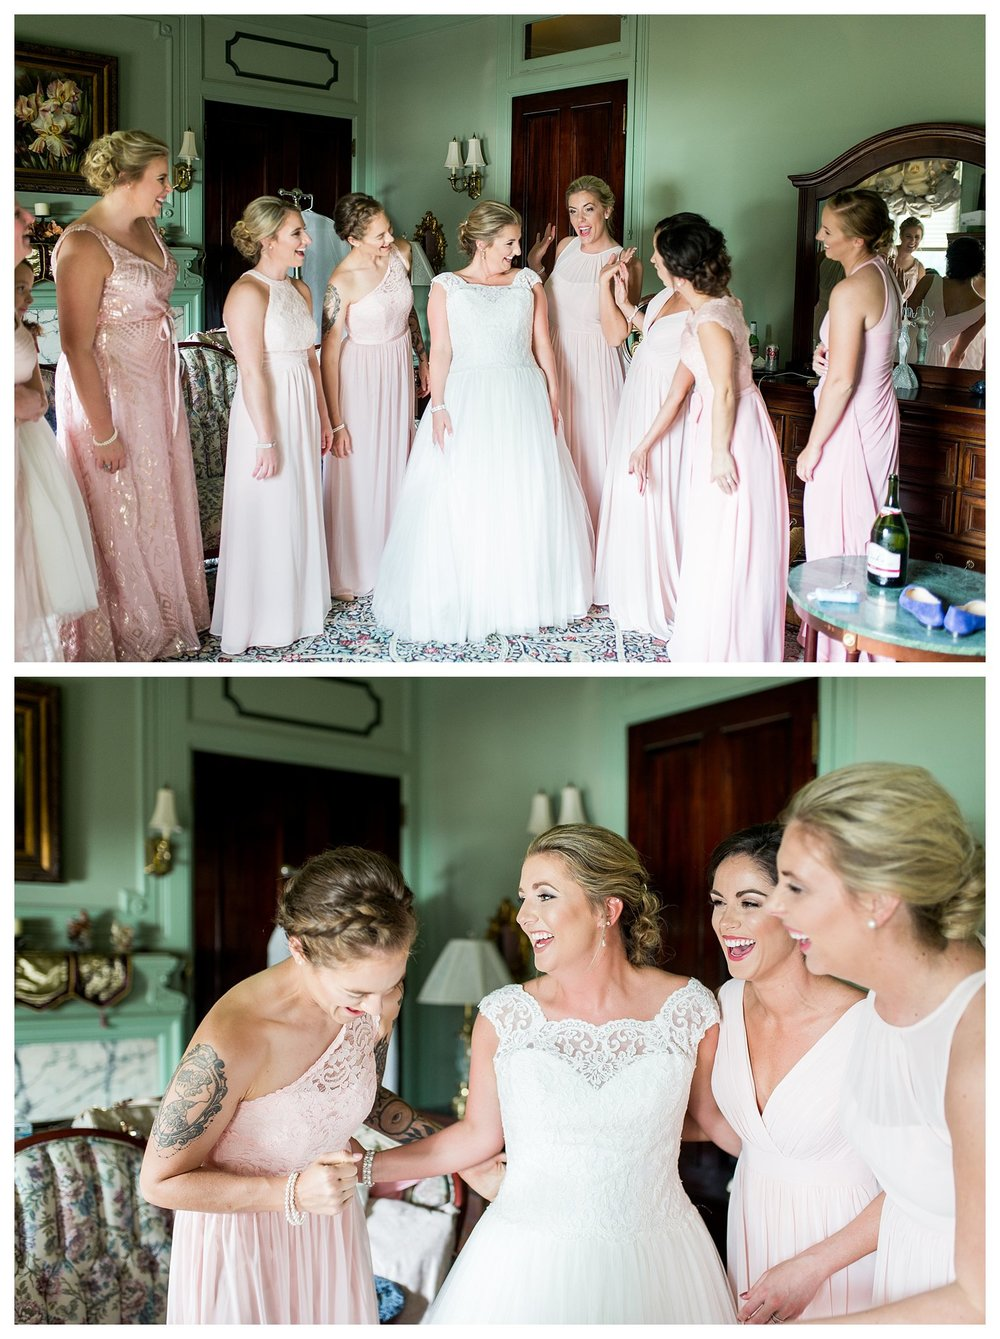 laurel-court-wedding-everleigh-photography-cincinnati-wedding-photographer-northern-ky-wedding-photographer-16